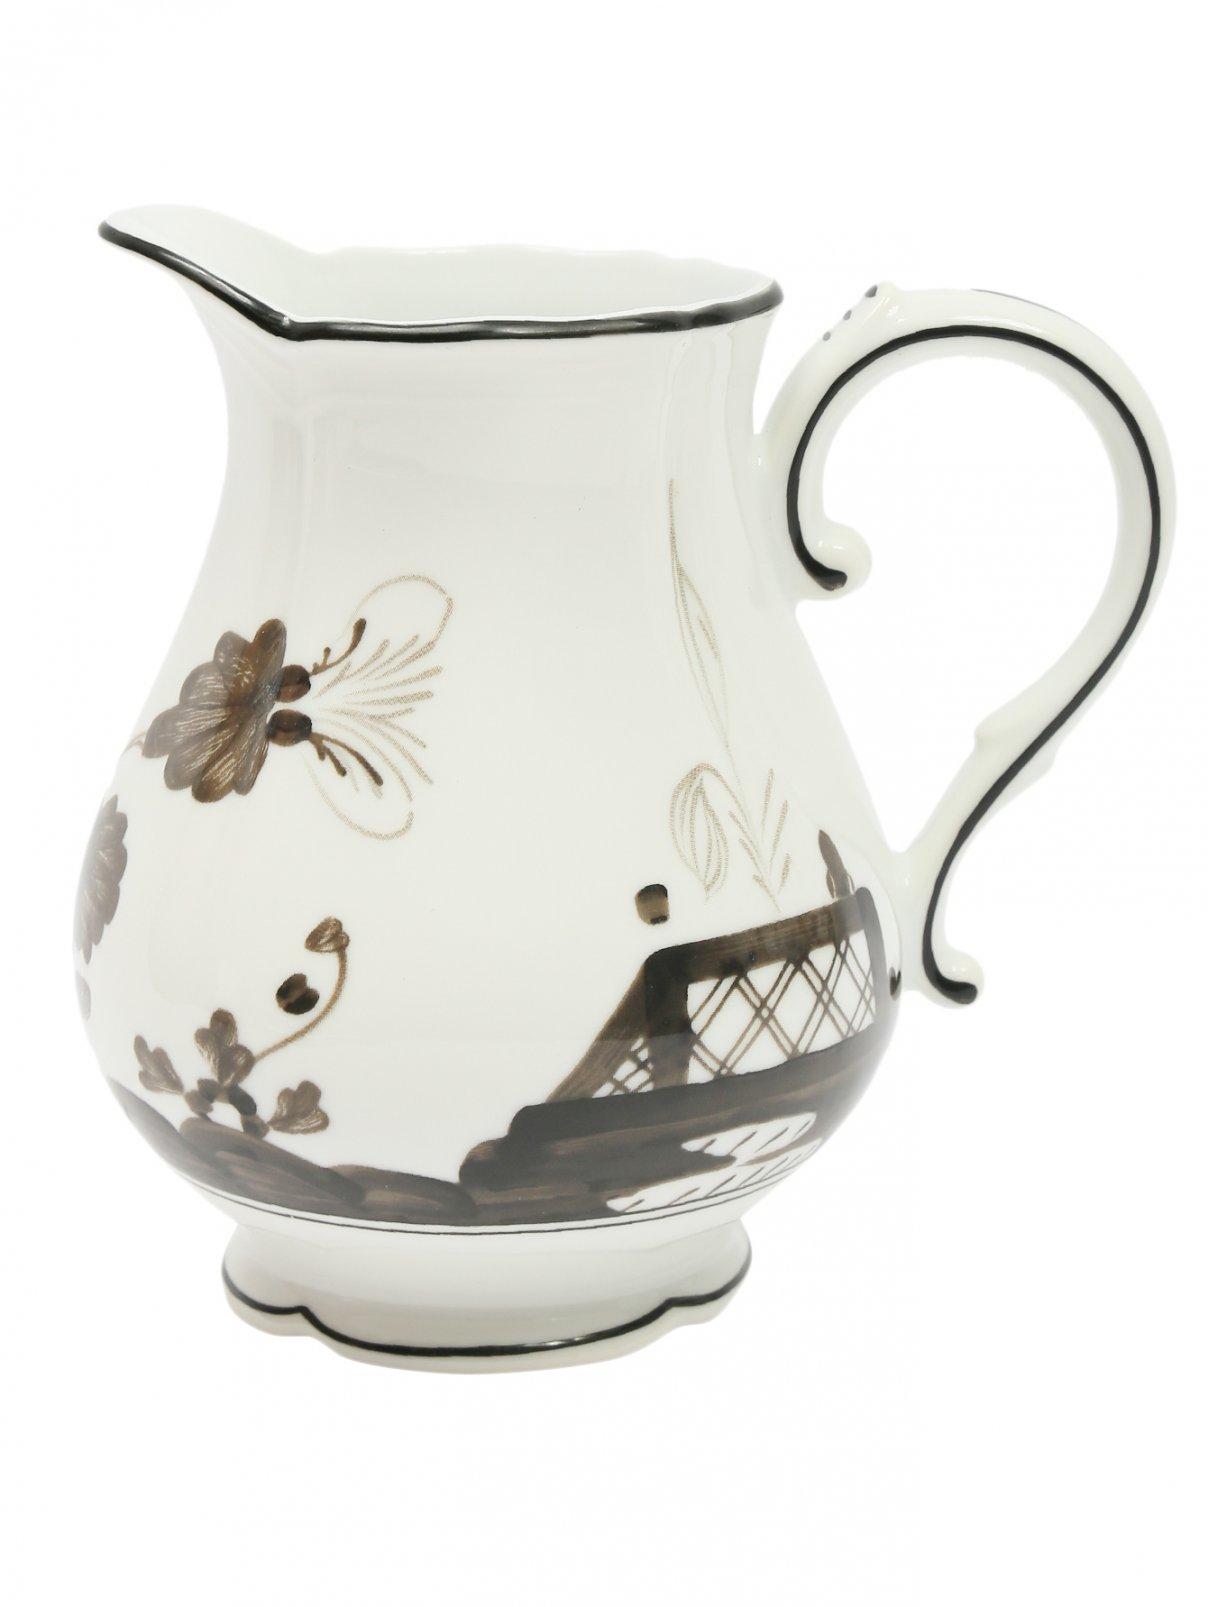 Молочник из фарфора с узором и окантовкой Richard Ginori 1735  –  Общий вид